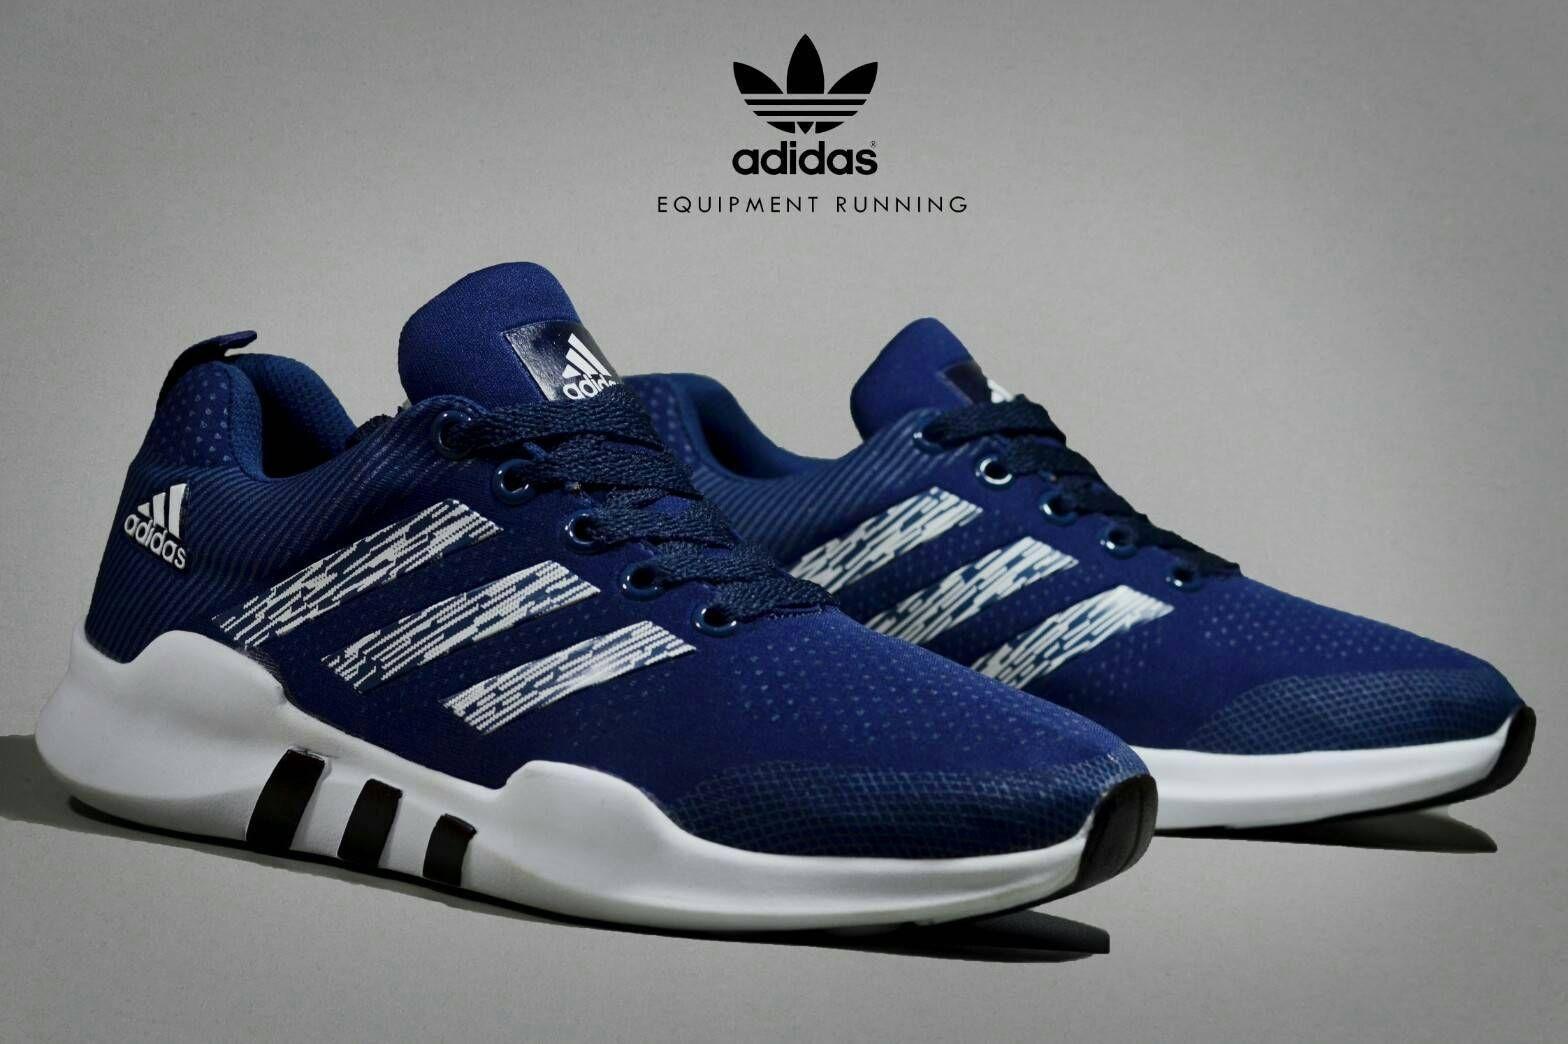 Harga Sepatu Boots Vans November 2018 Situs Marketplace Semi Humm3r Balado Sporty Gaya Pria Terkini Joging Running Slipon Pantofel Biru